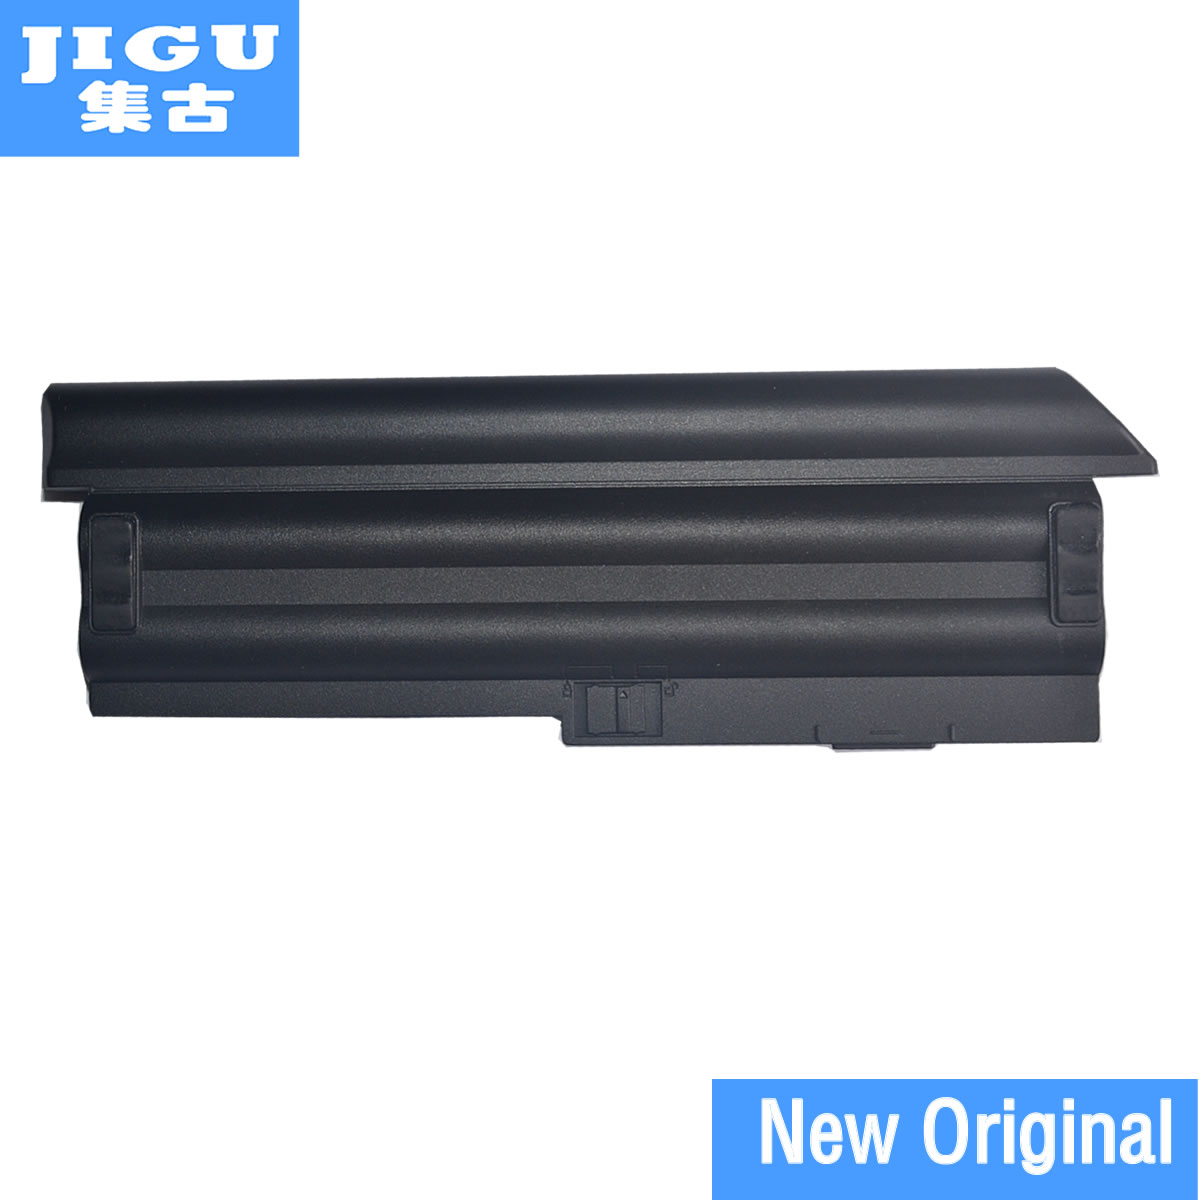 JIGU Free shipping 0A36282 42T4873 42T4875 42T4940 42T4941 Original laptop Battery For Lenovo ThinkPad X220 x220s x220i 9cells цены онлайн